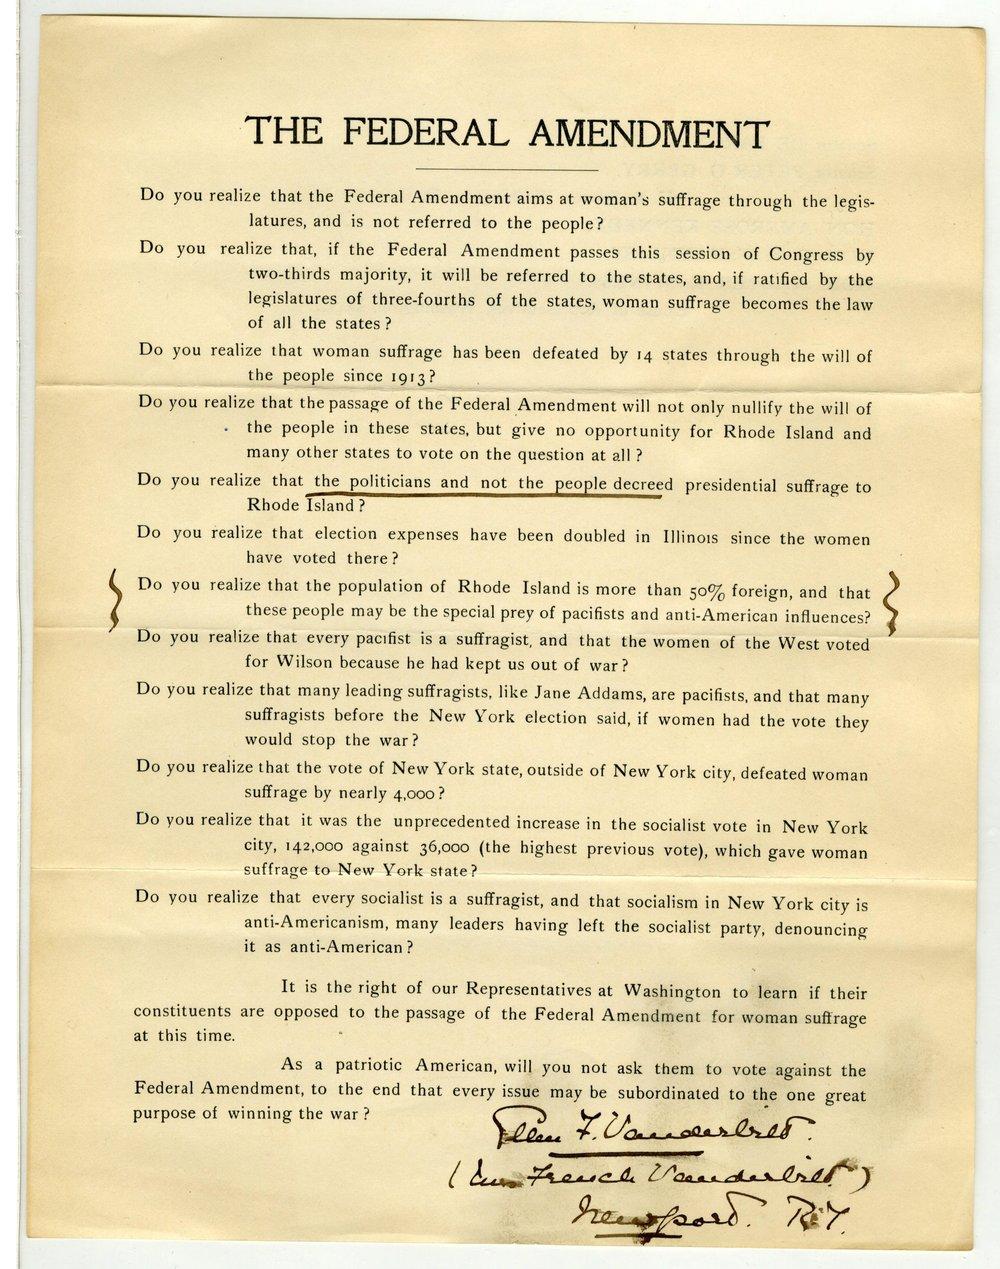 Letter Regarding the Federal Amendment from Ellen F. Vanderbilt